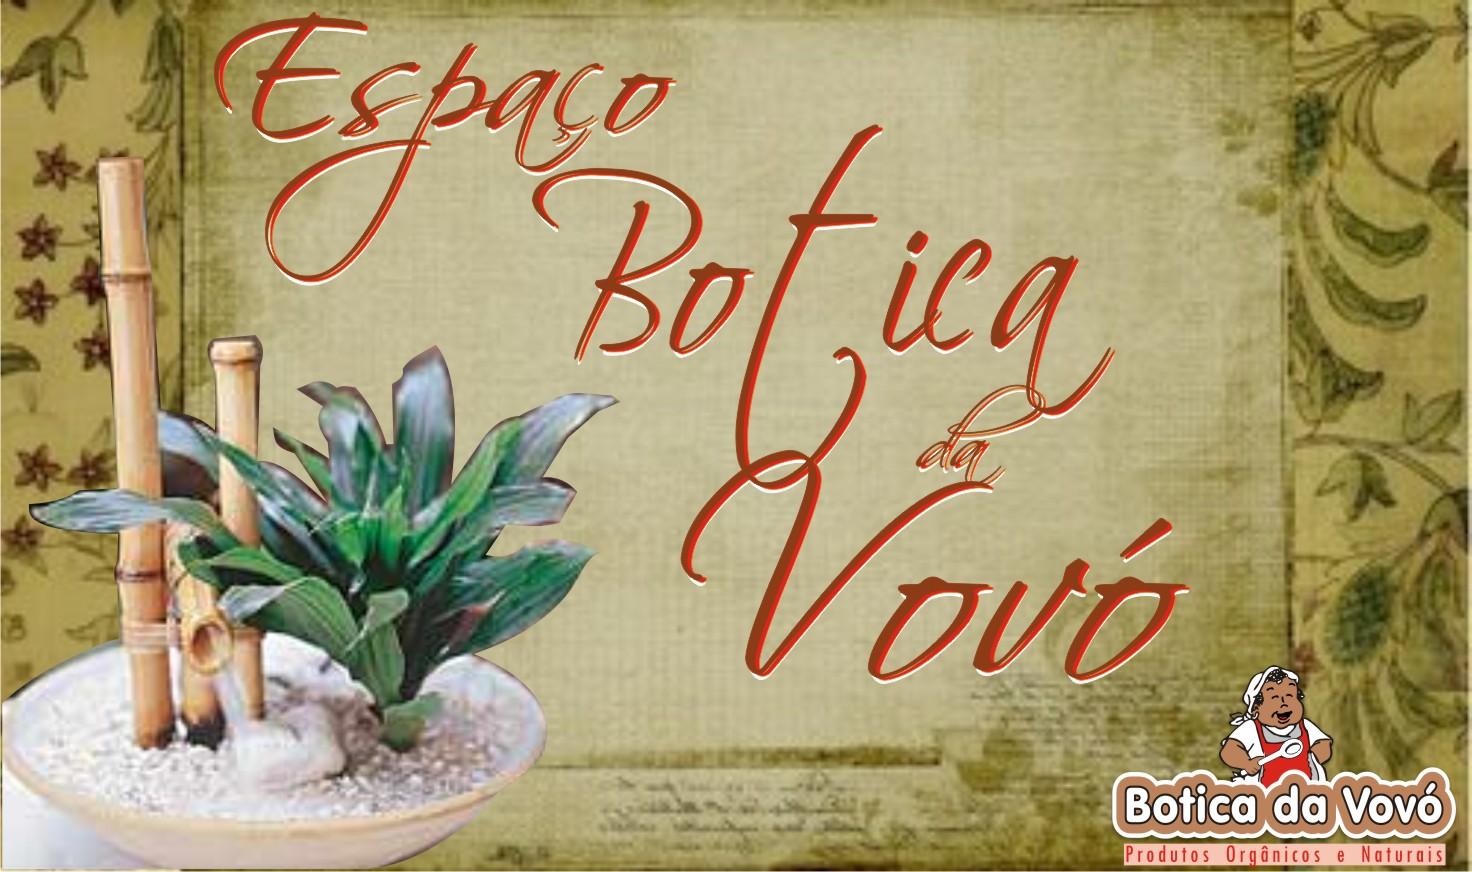 BOTICA DA VOVÓ Festas